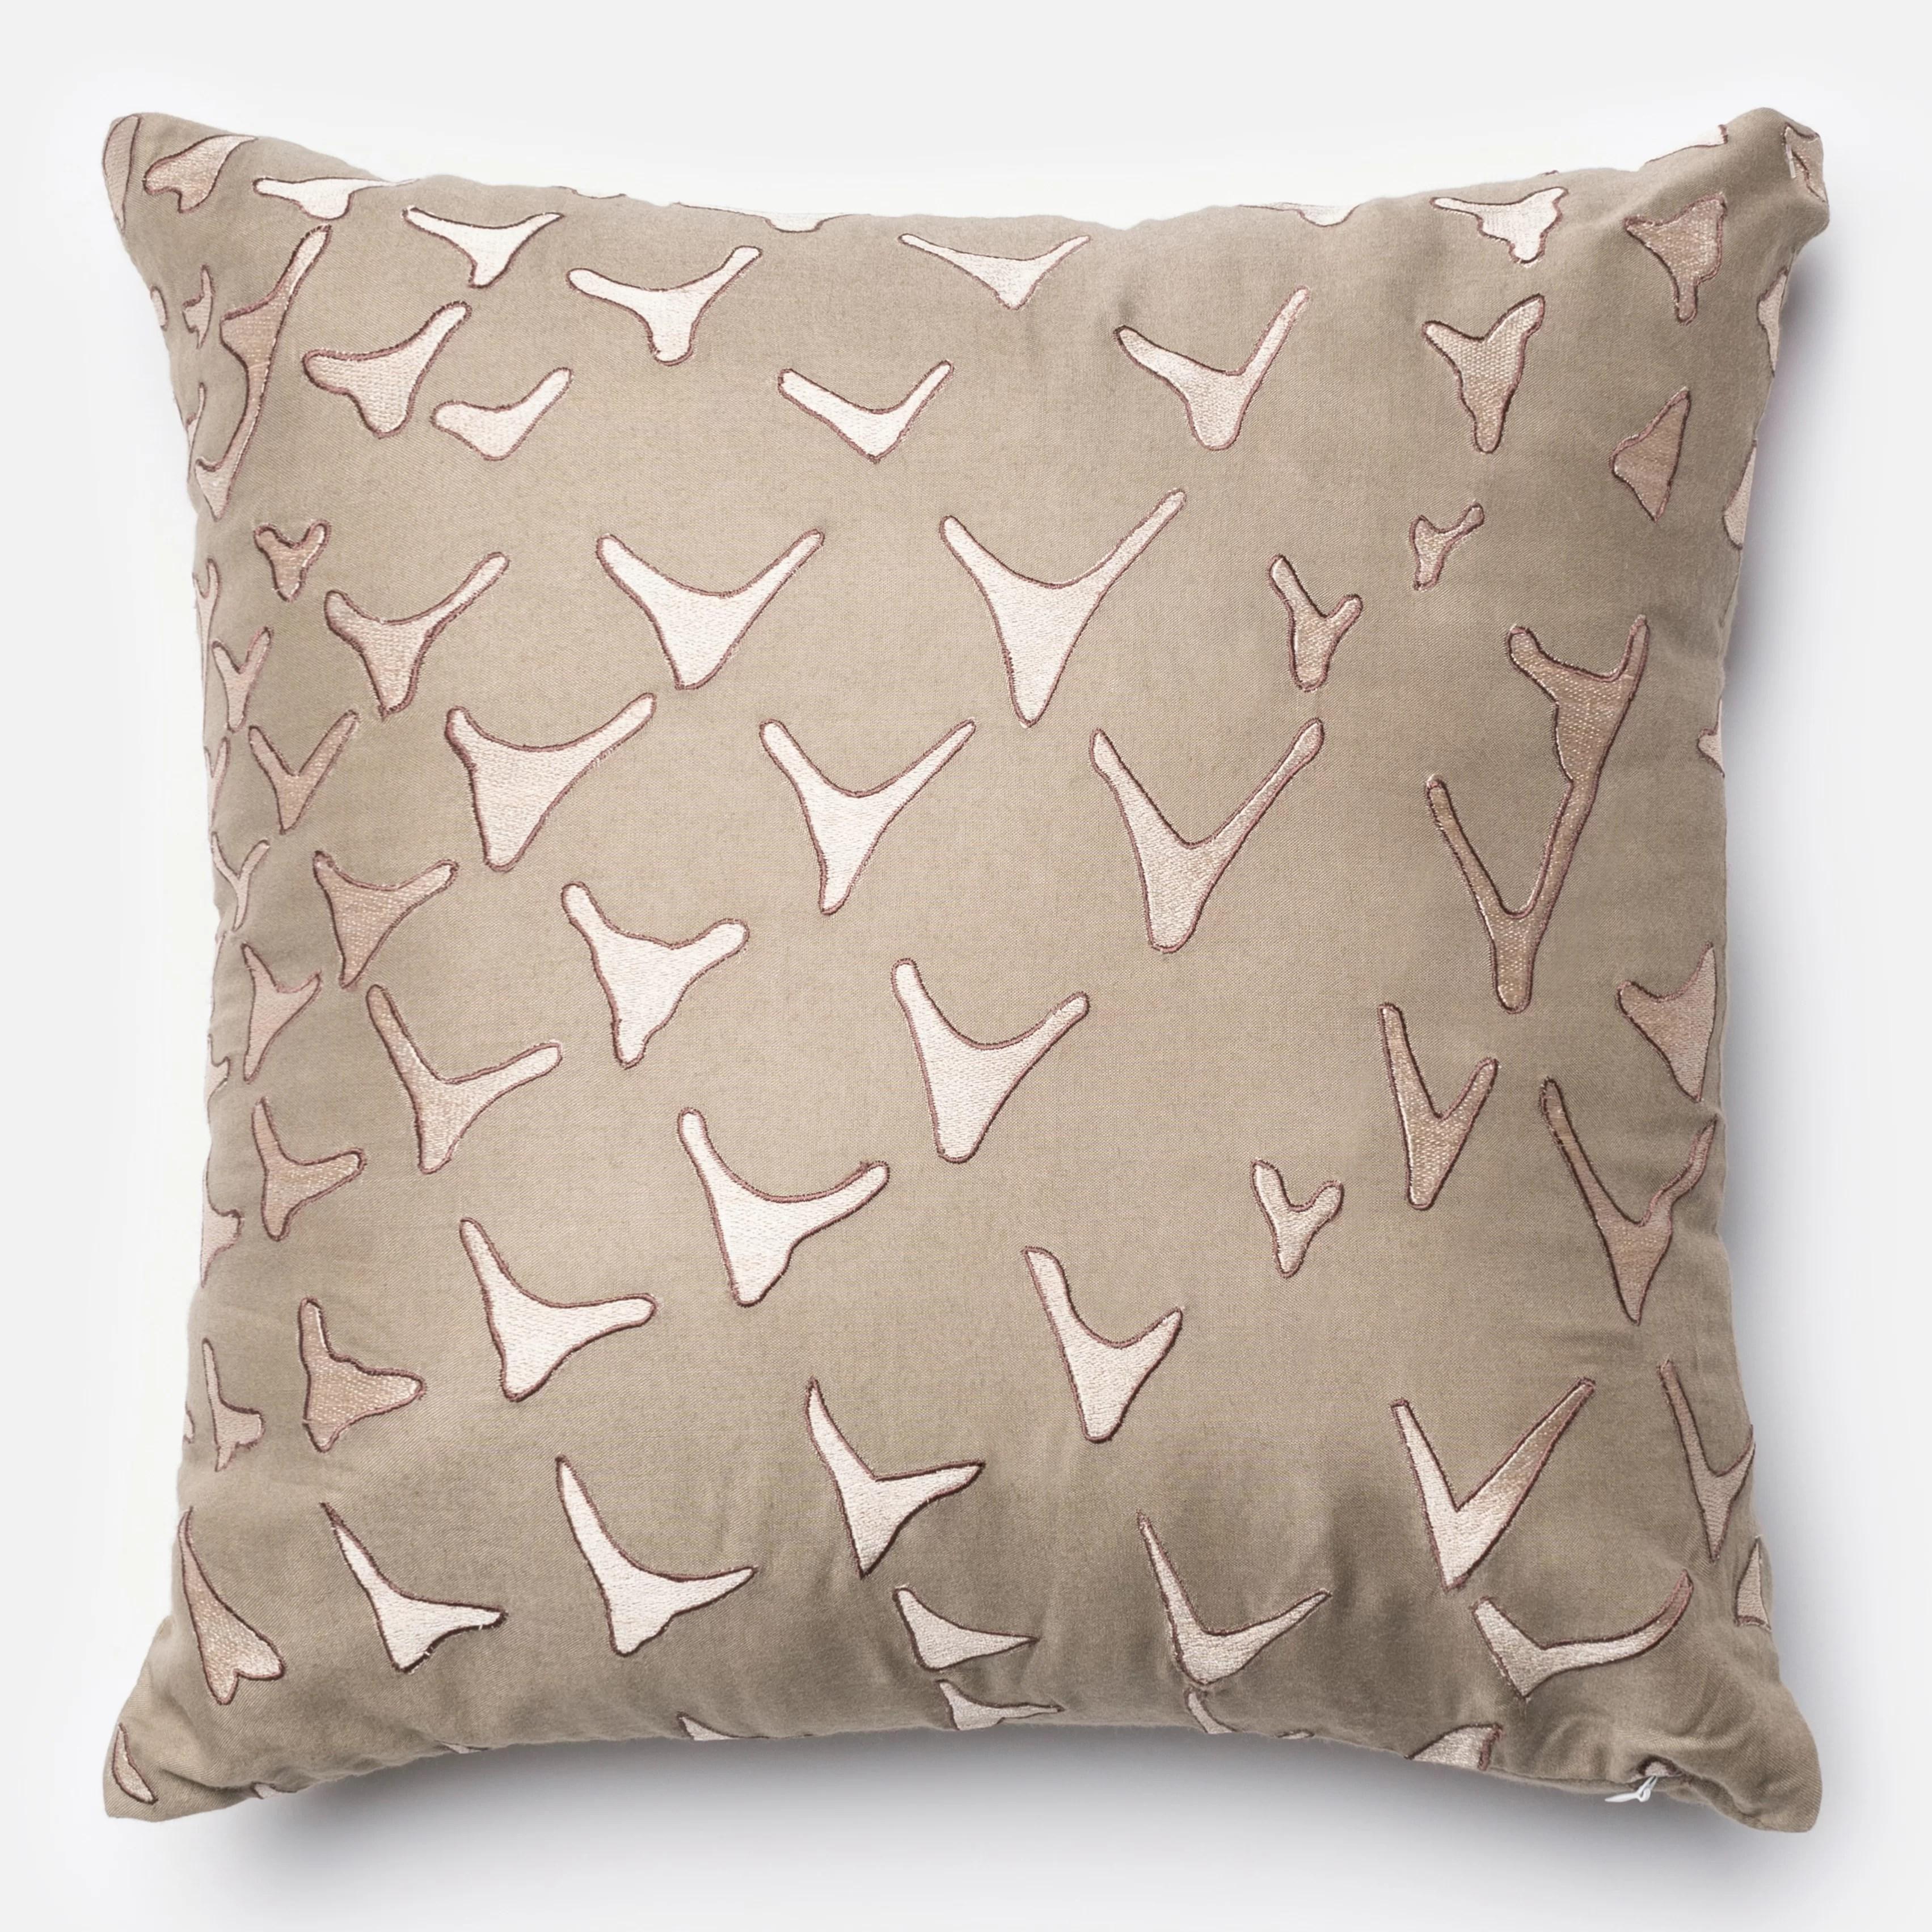 Loloi Rugs Silk Throw Pillow & Reviews